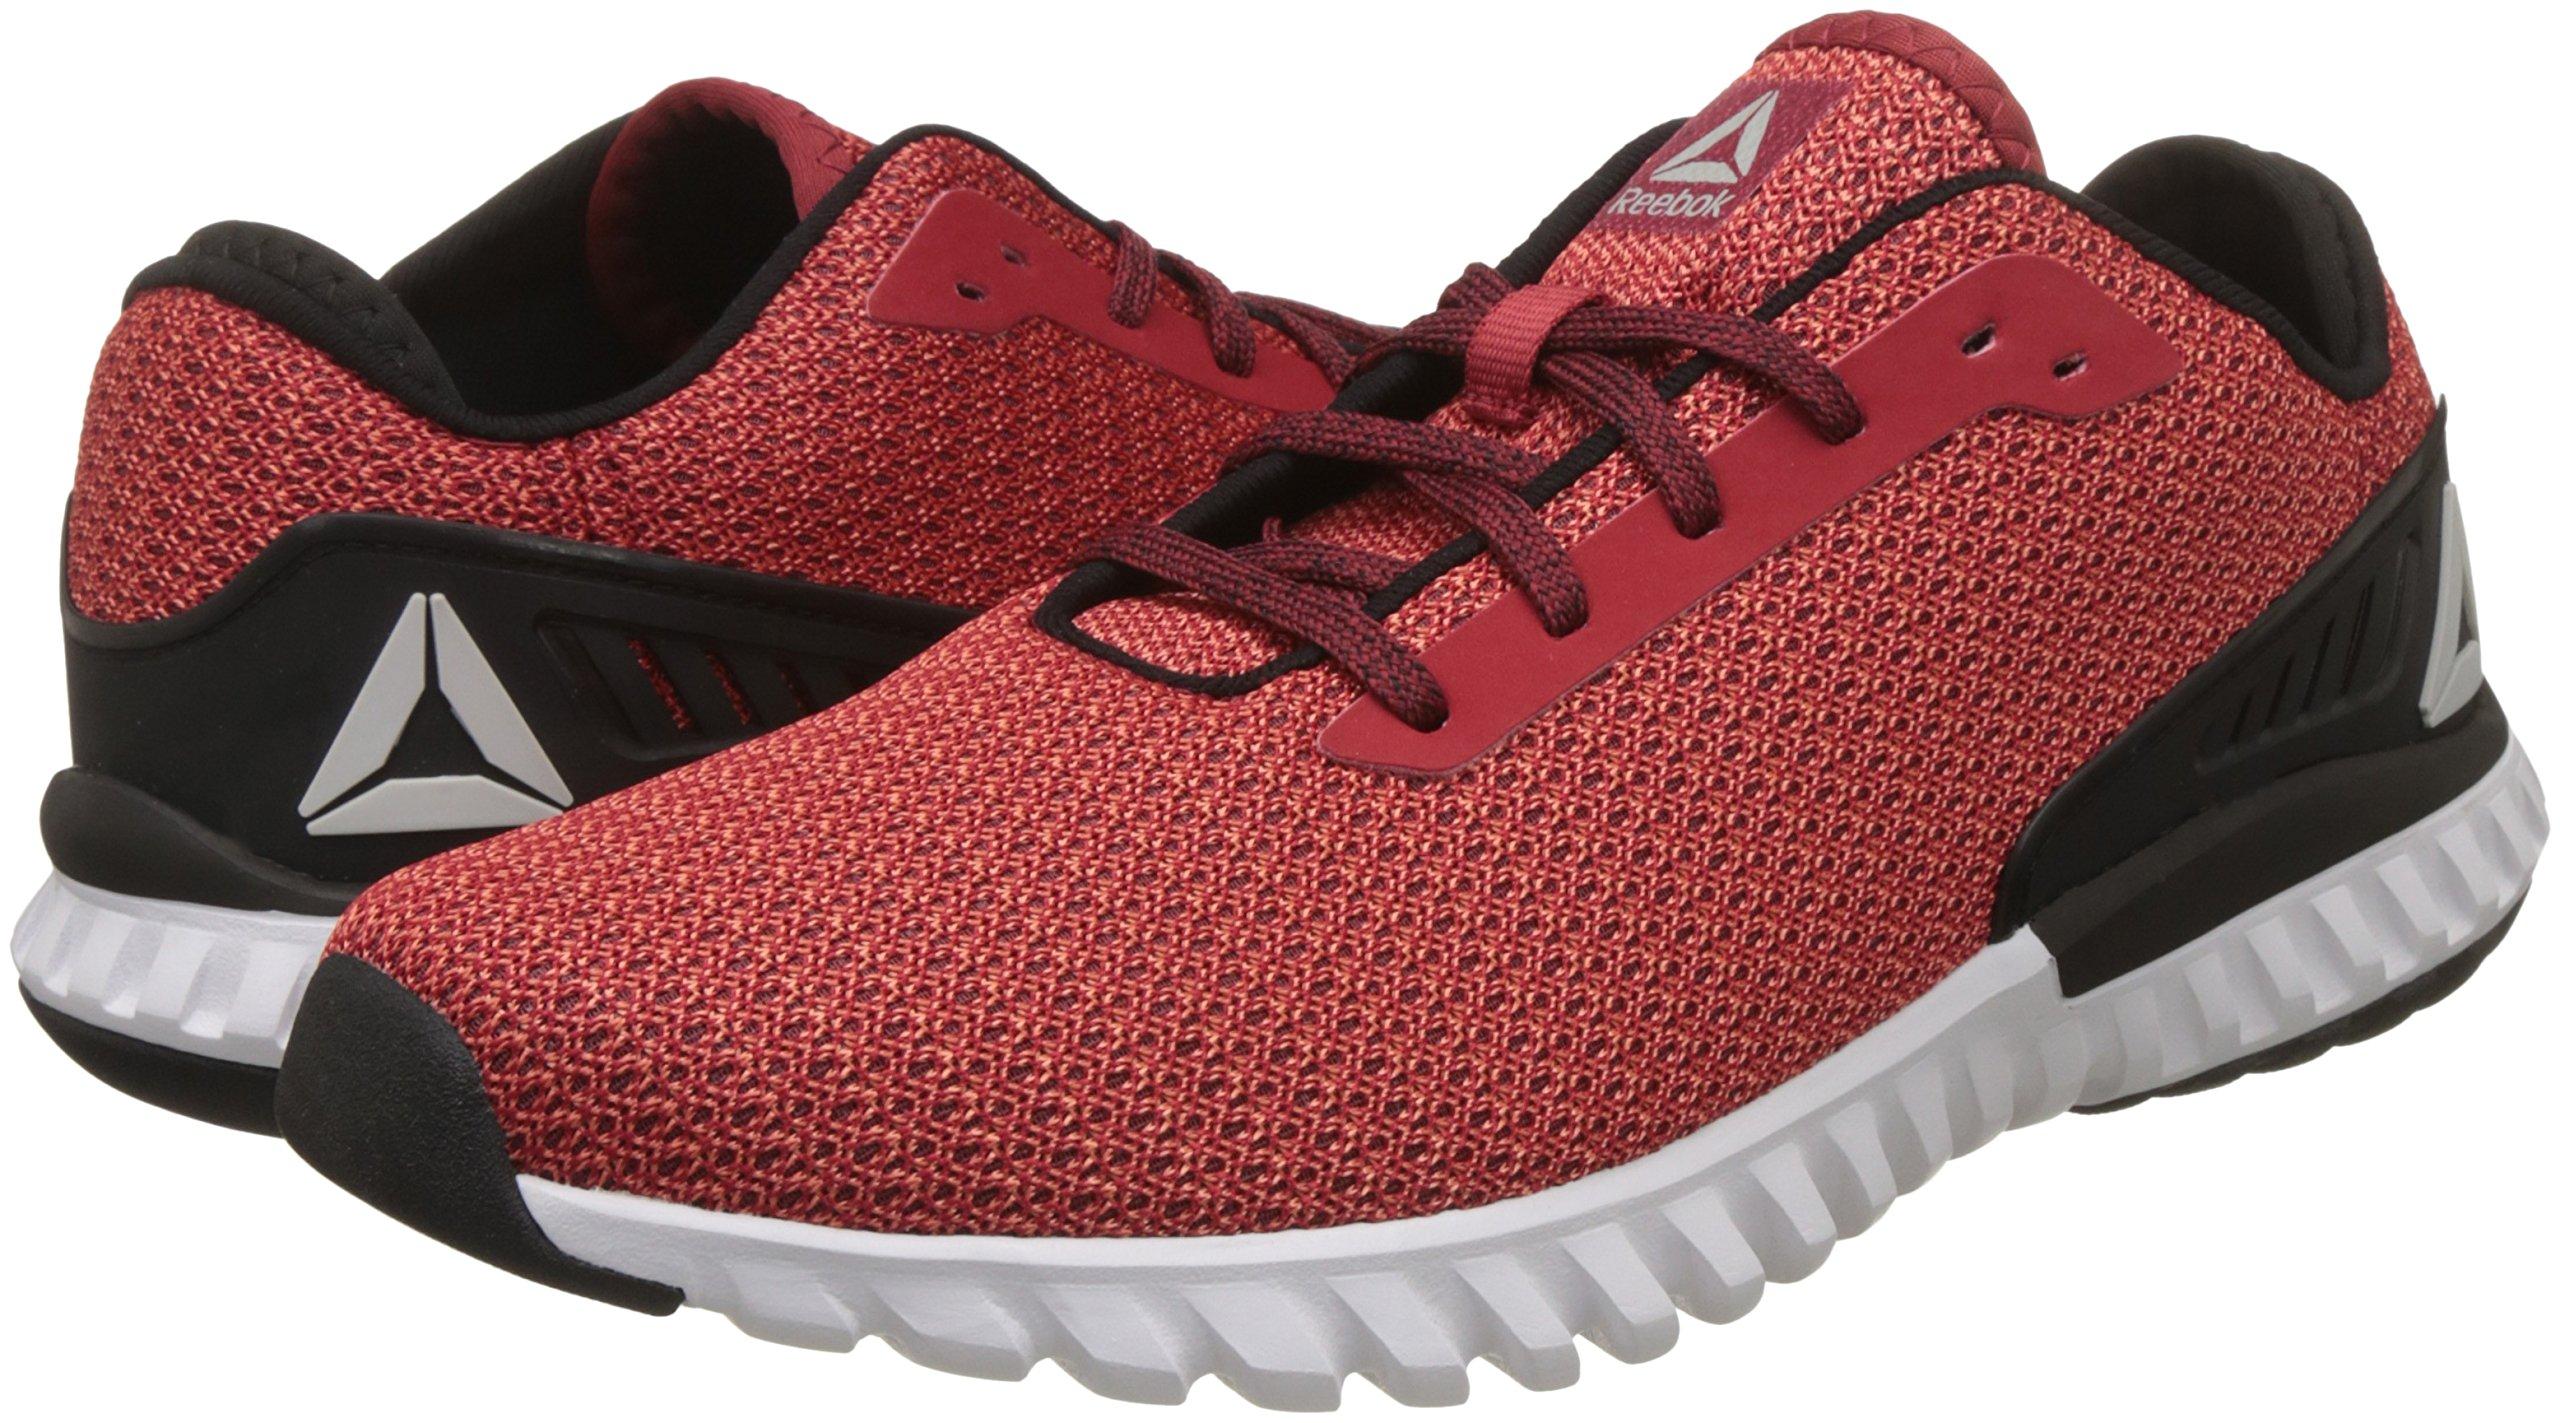 Reebok Men's Wave Ride Running Shoes